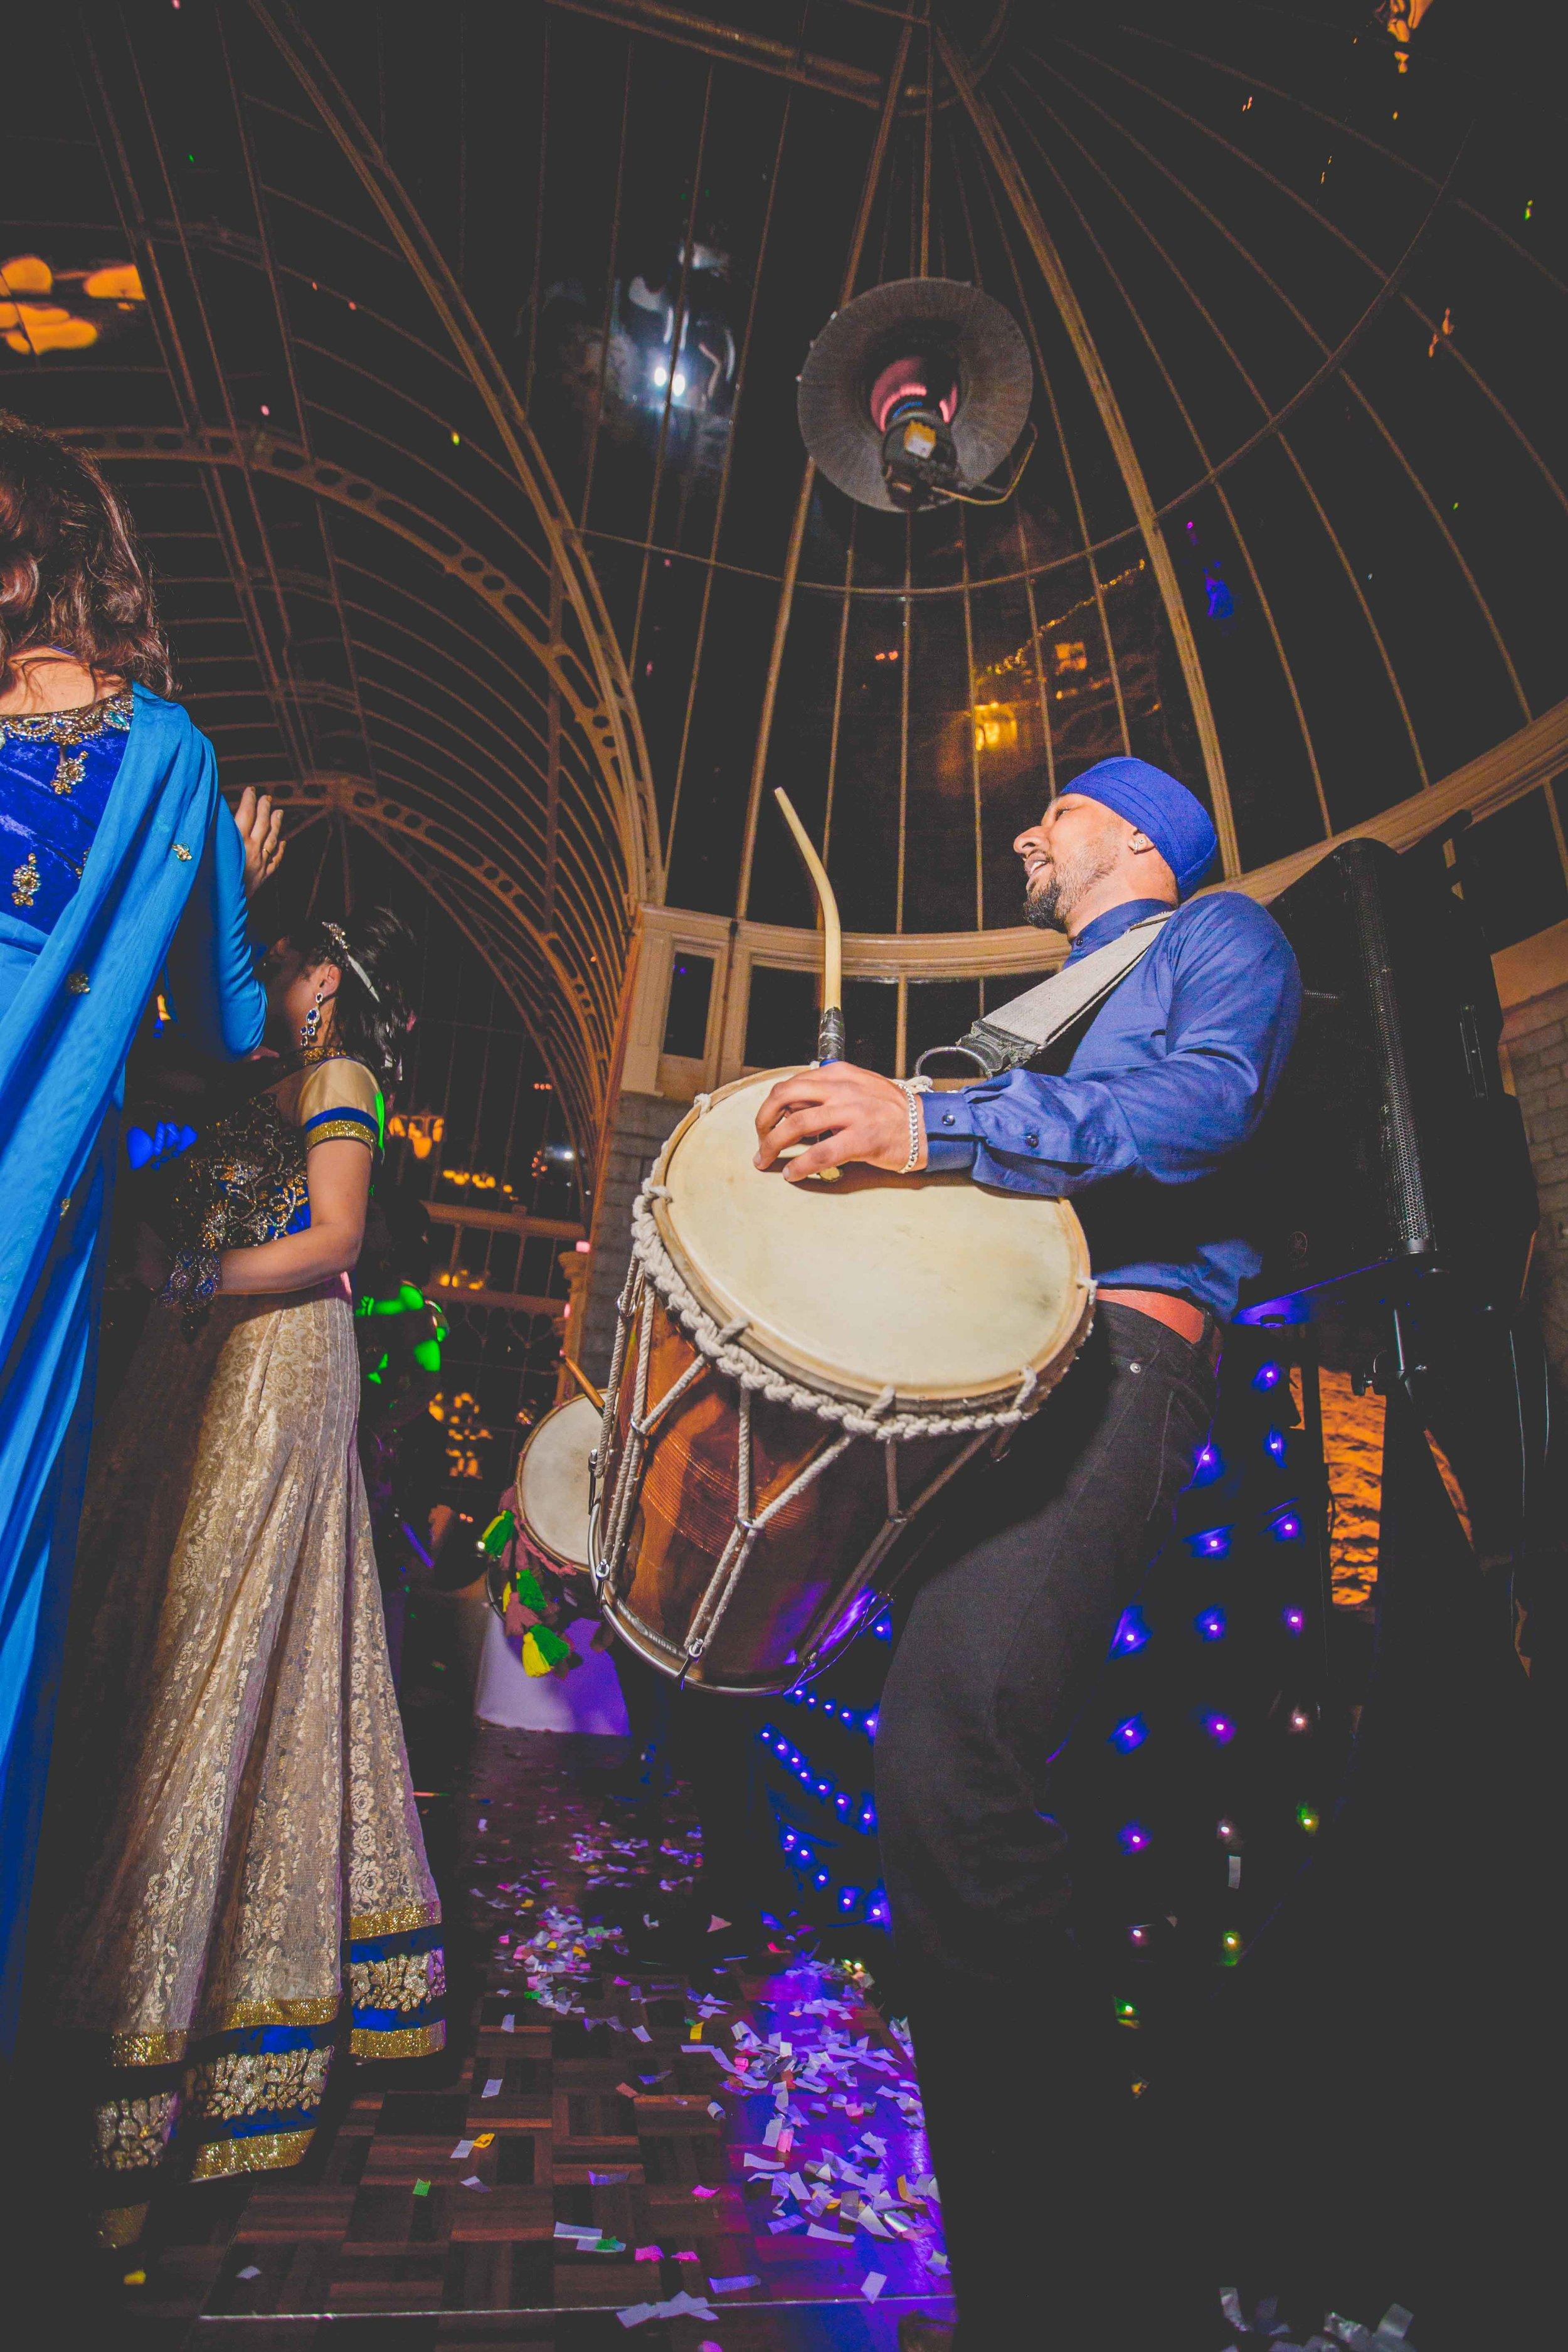 tortworth-Hotel-gloucester-birthday-wedding-photographer-natalia-smith-photography-40.jpg